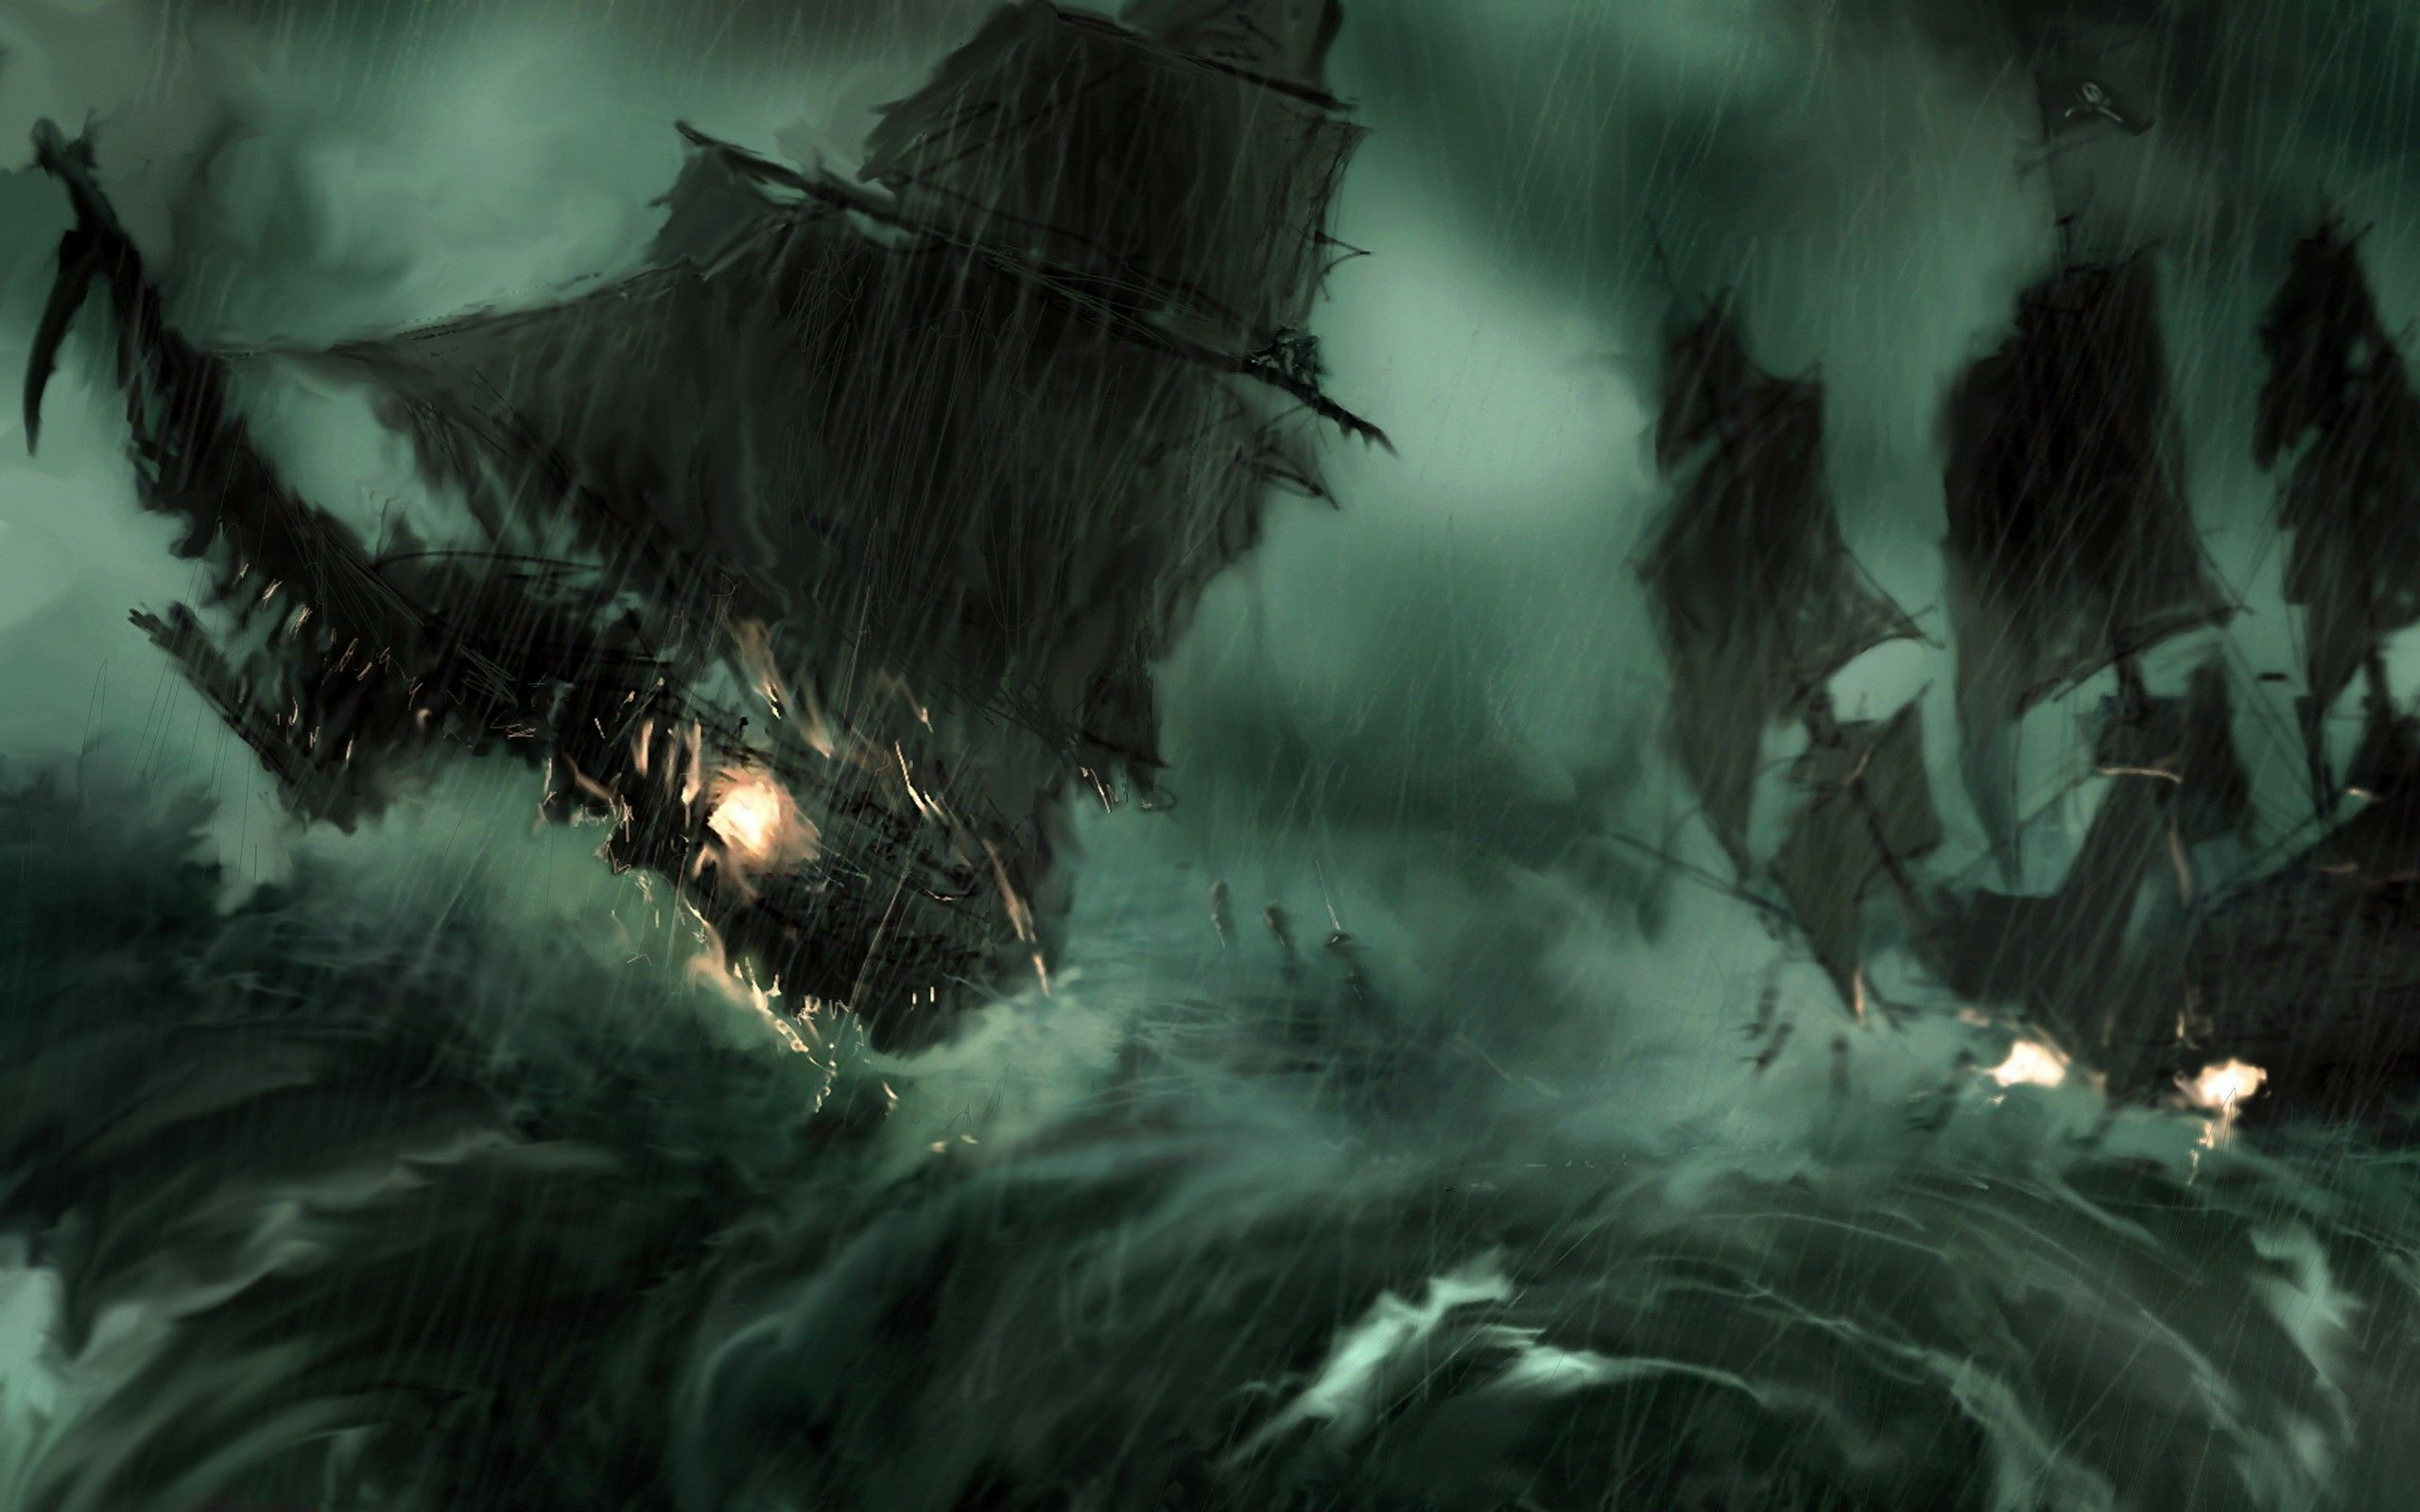 paintings rain pirate ship storm Pirates of the Caribbean artwork sail ship  / 2560x1600 Wallpaper